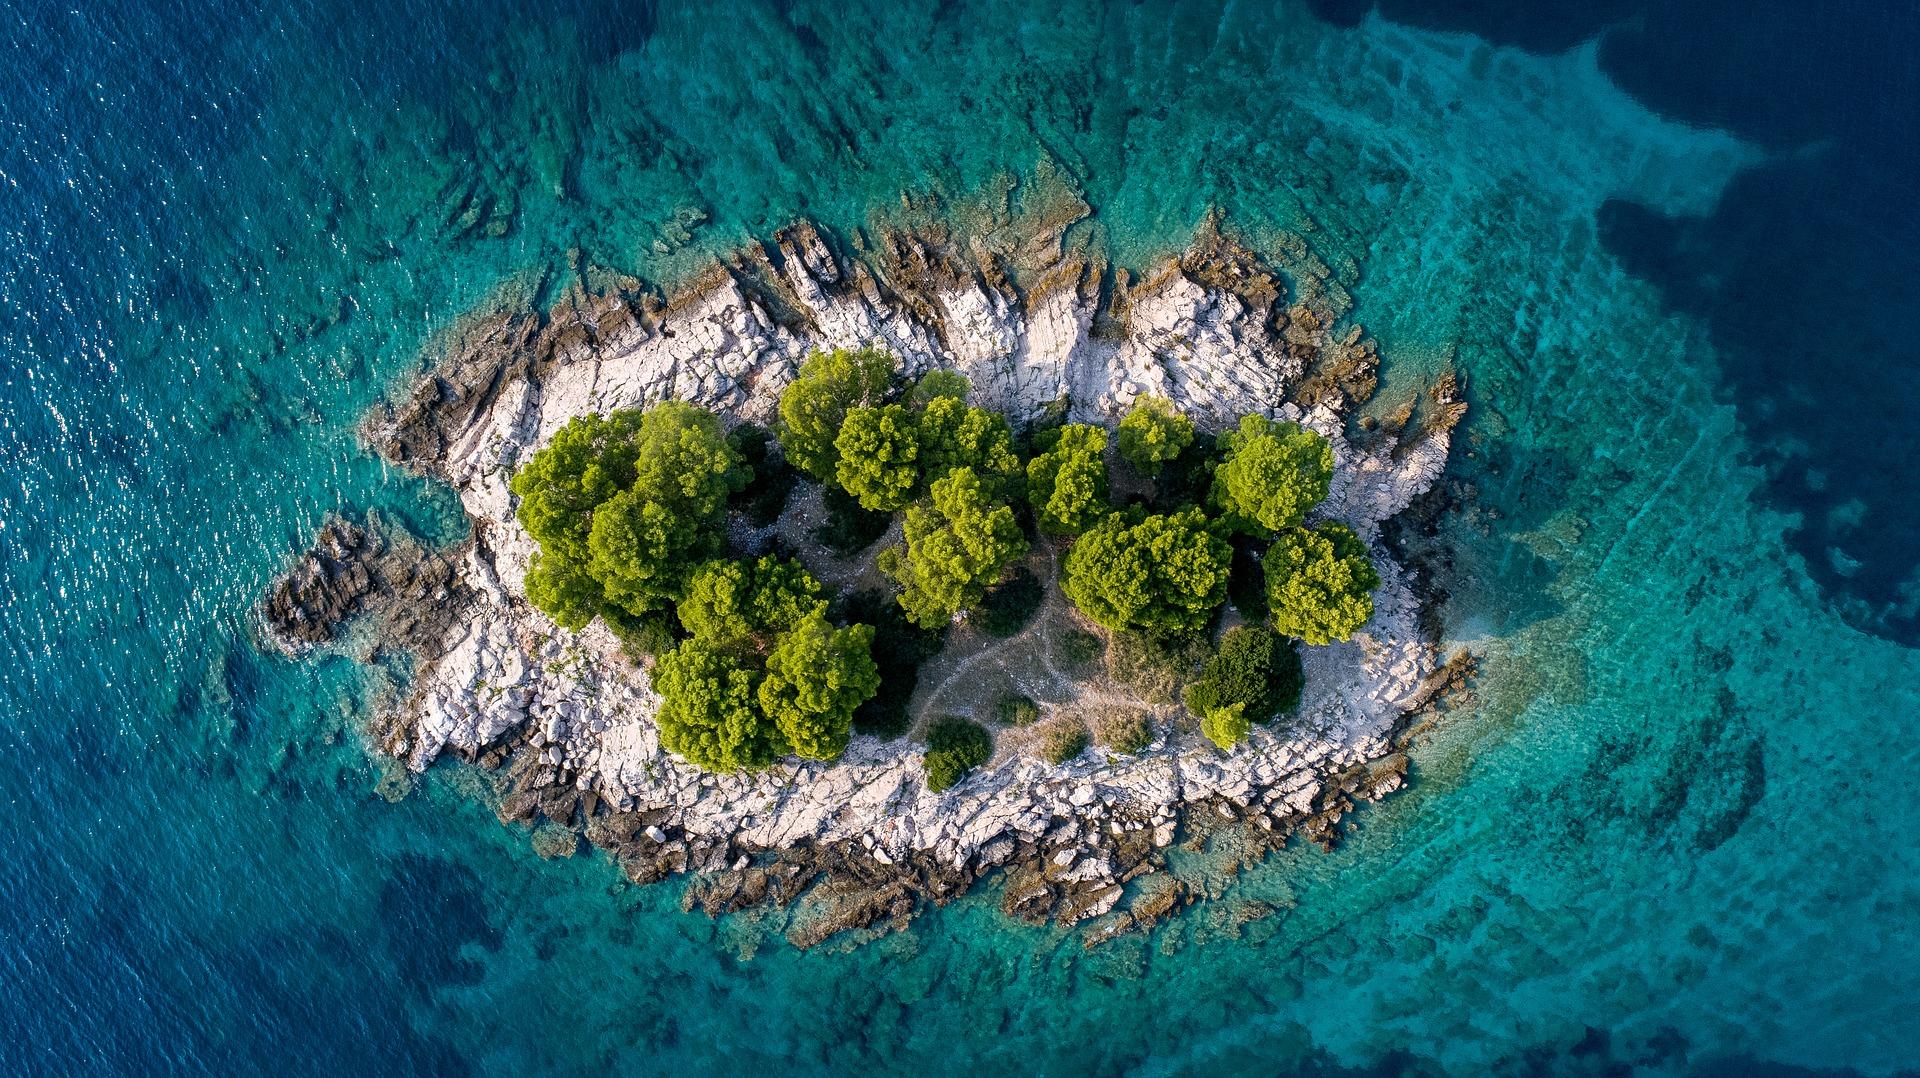 island-3647522_1920.jpg